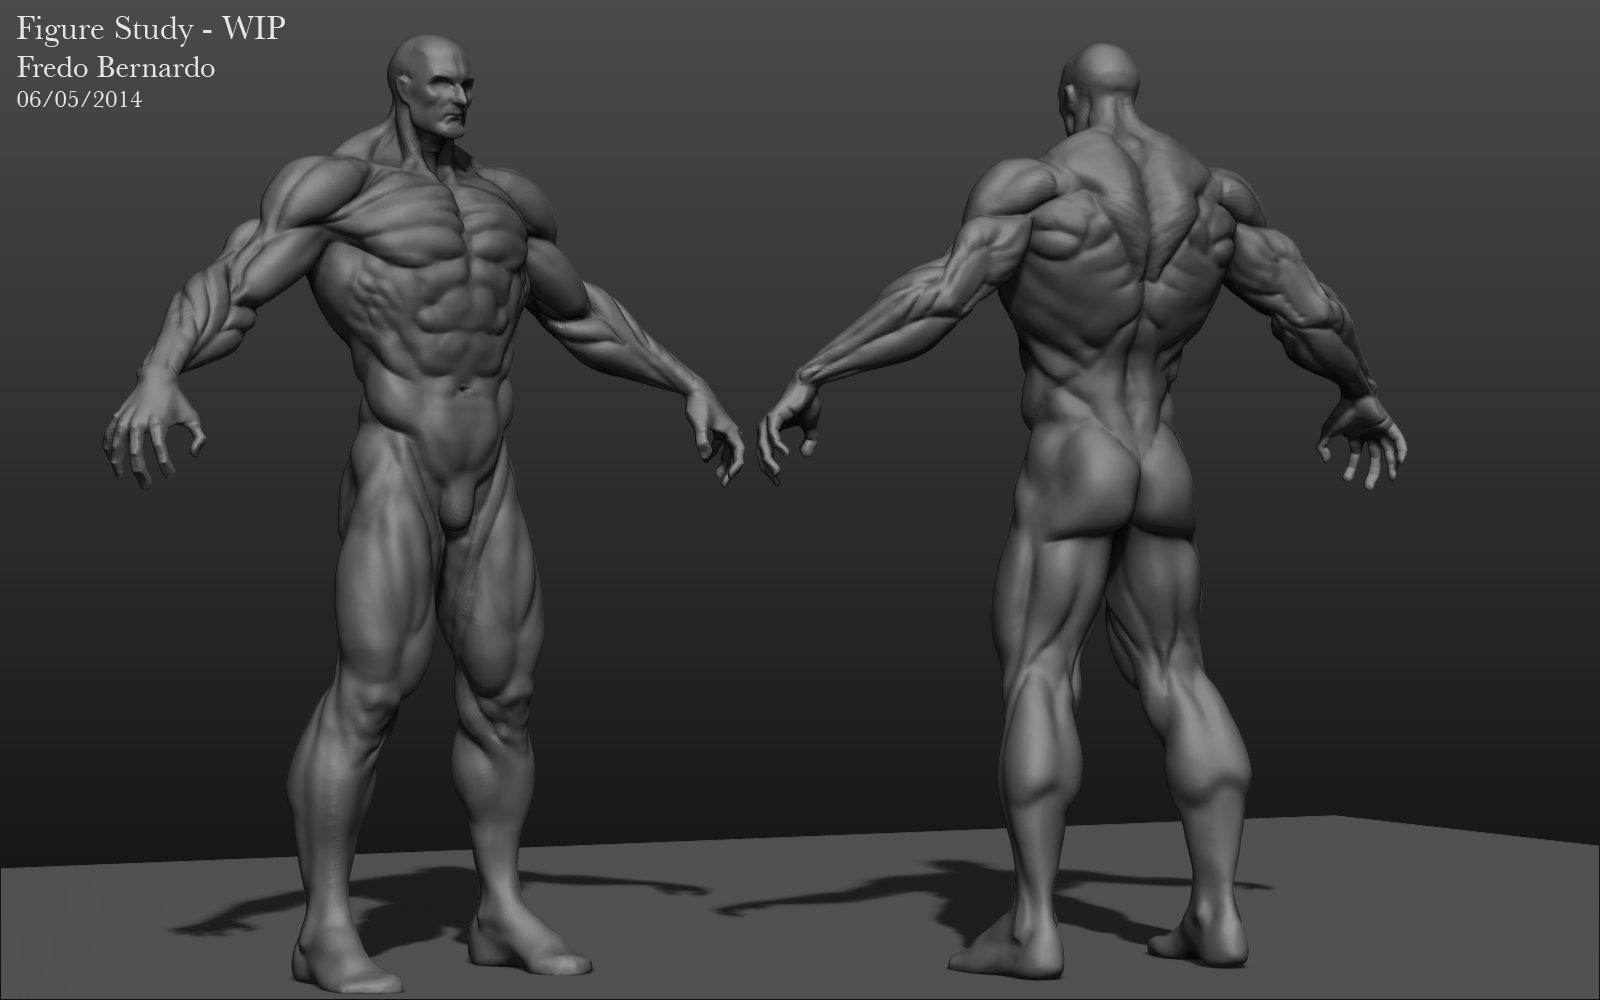 Male Figure Study (WIP)